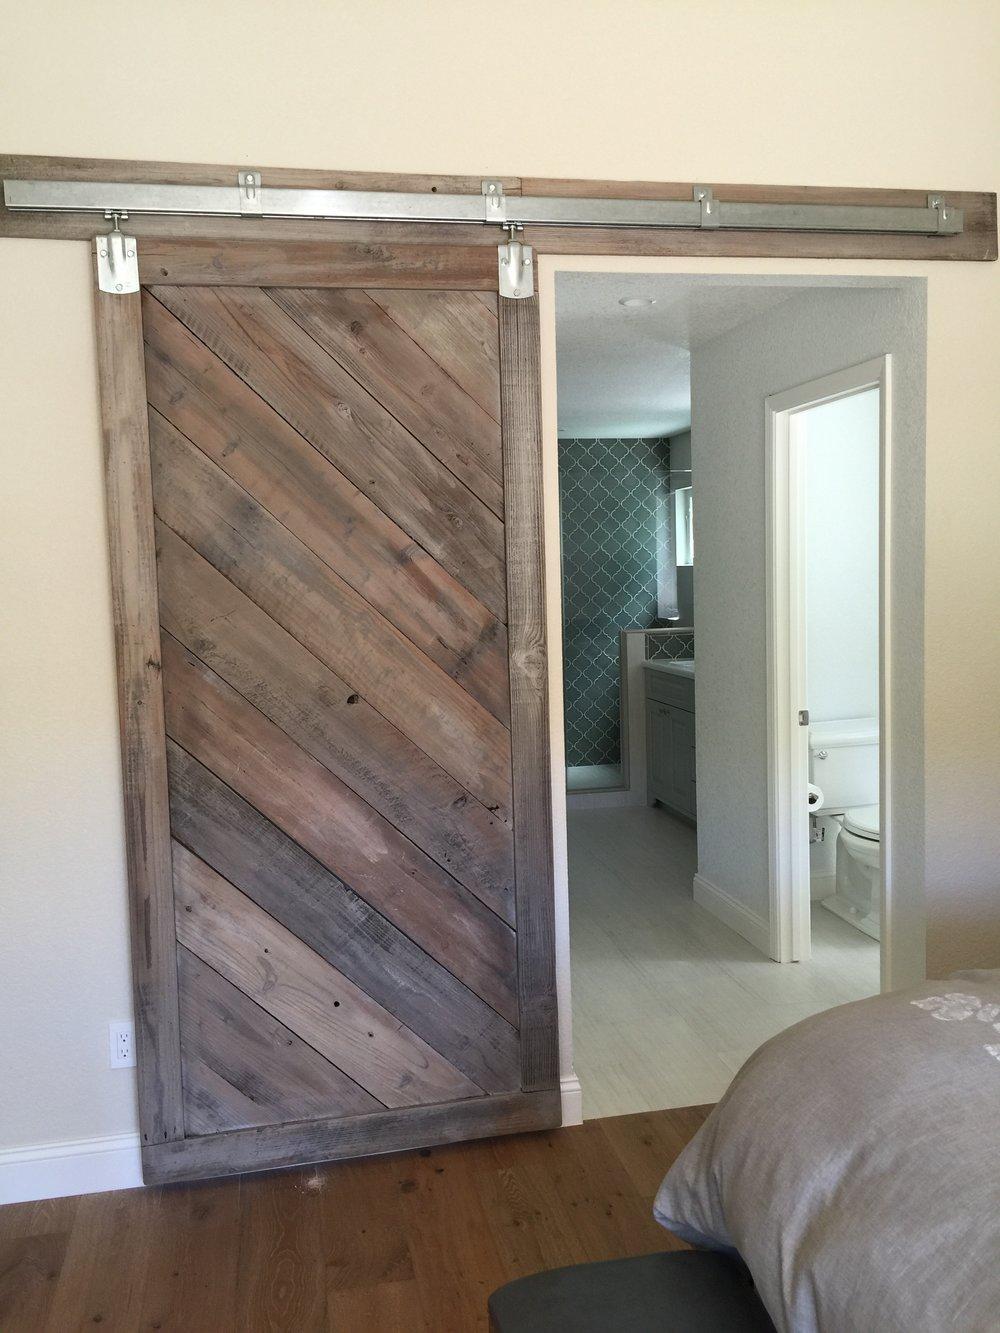 Sliding door in mid-century style home.